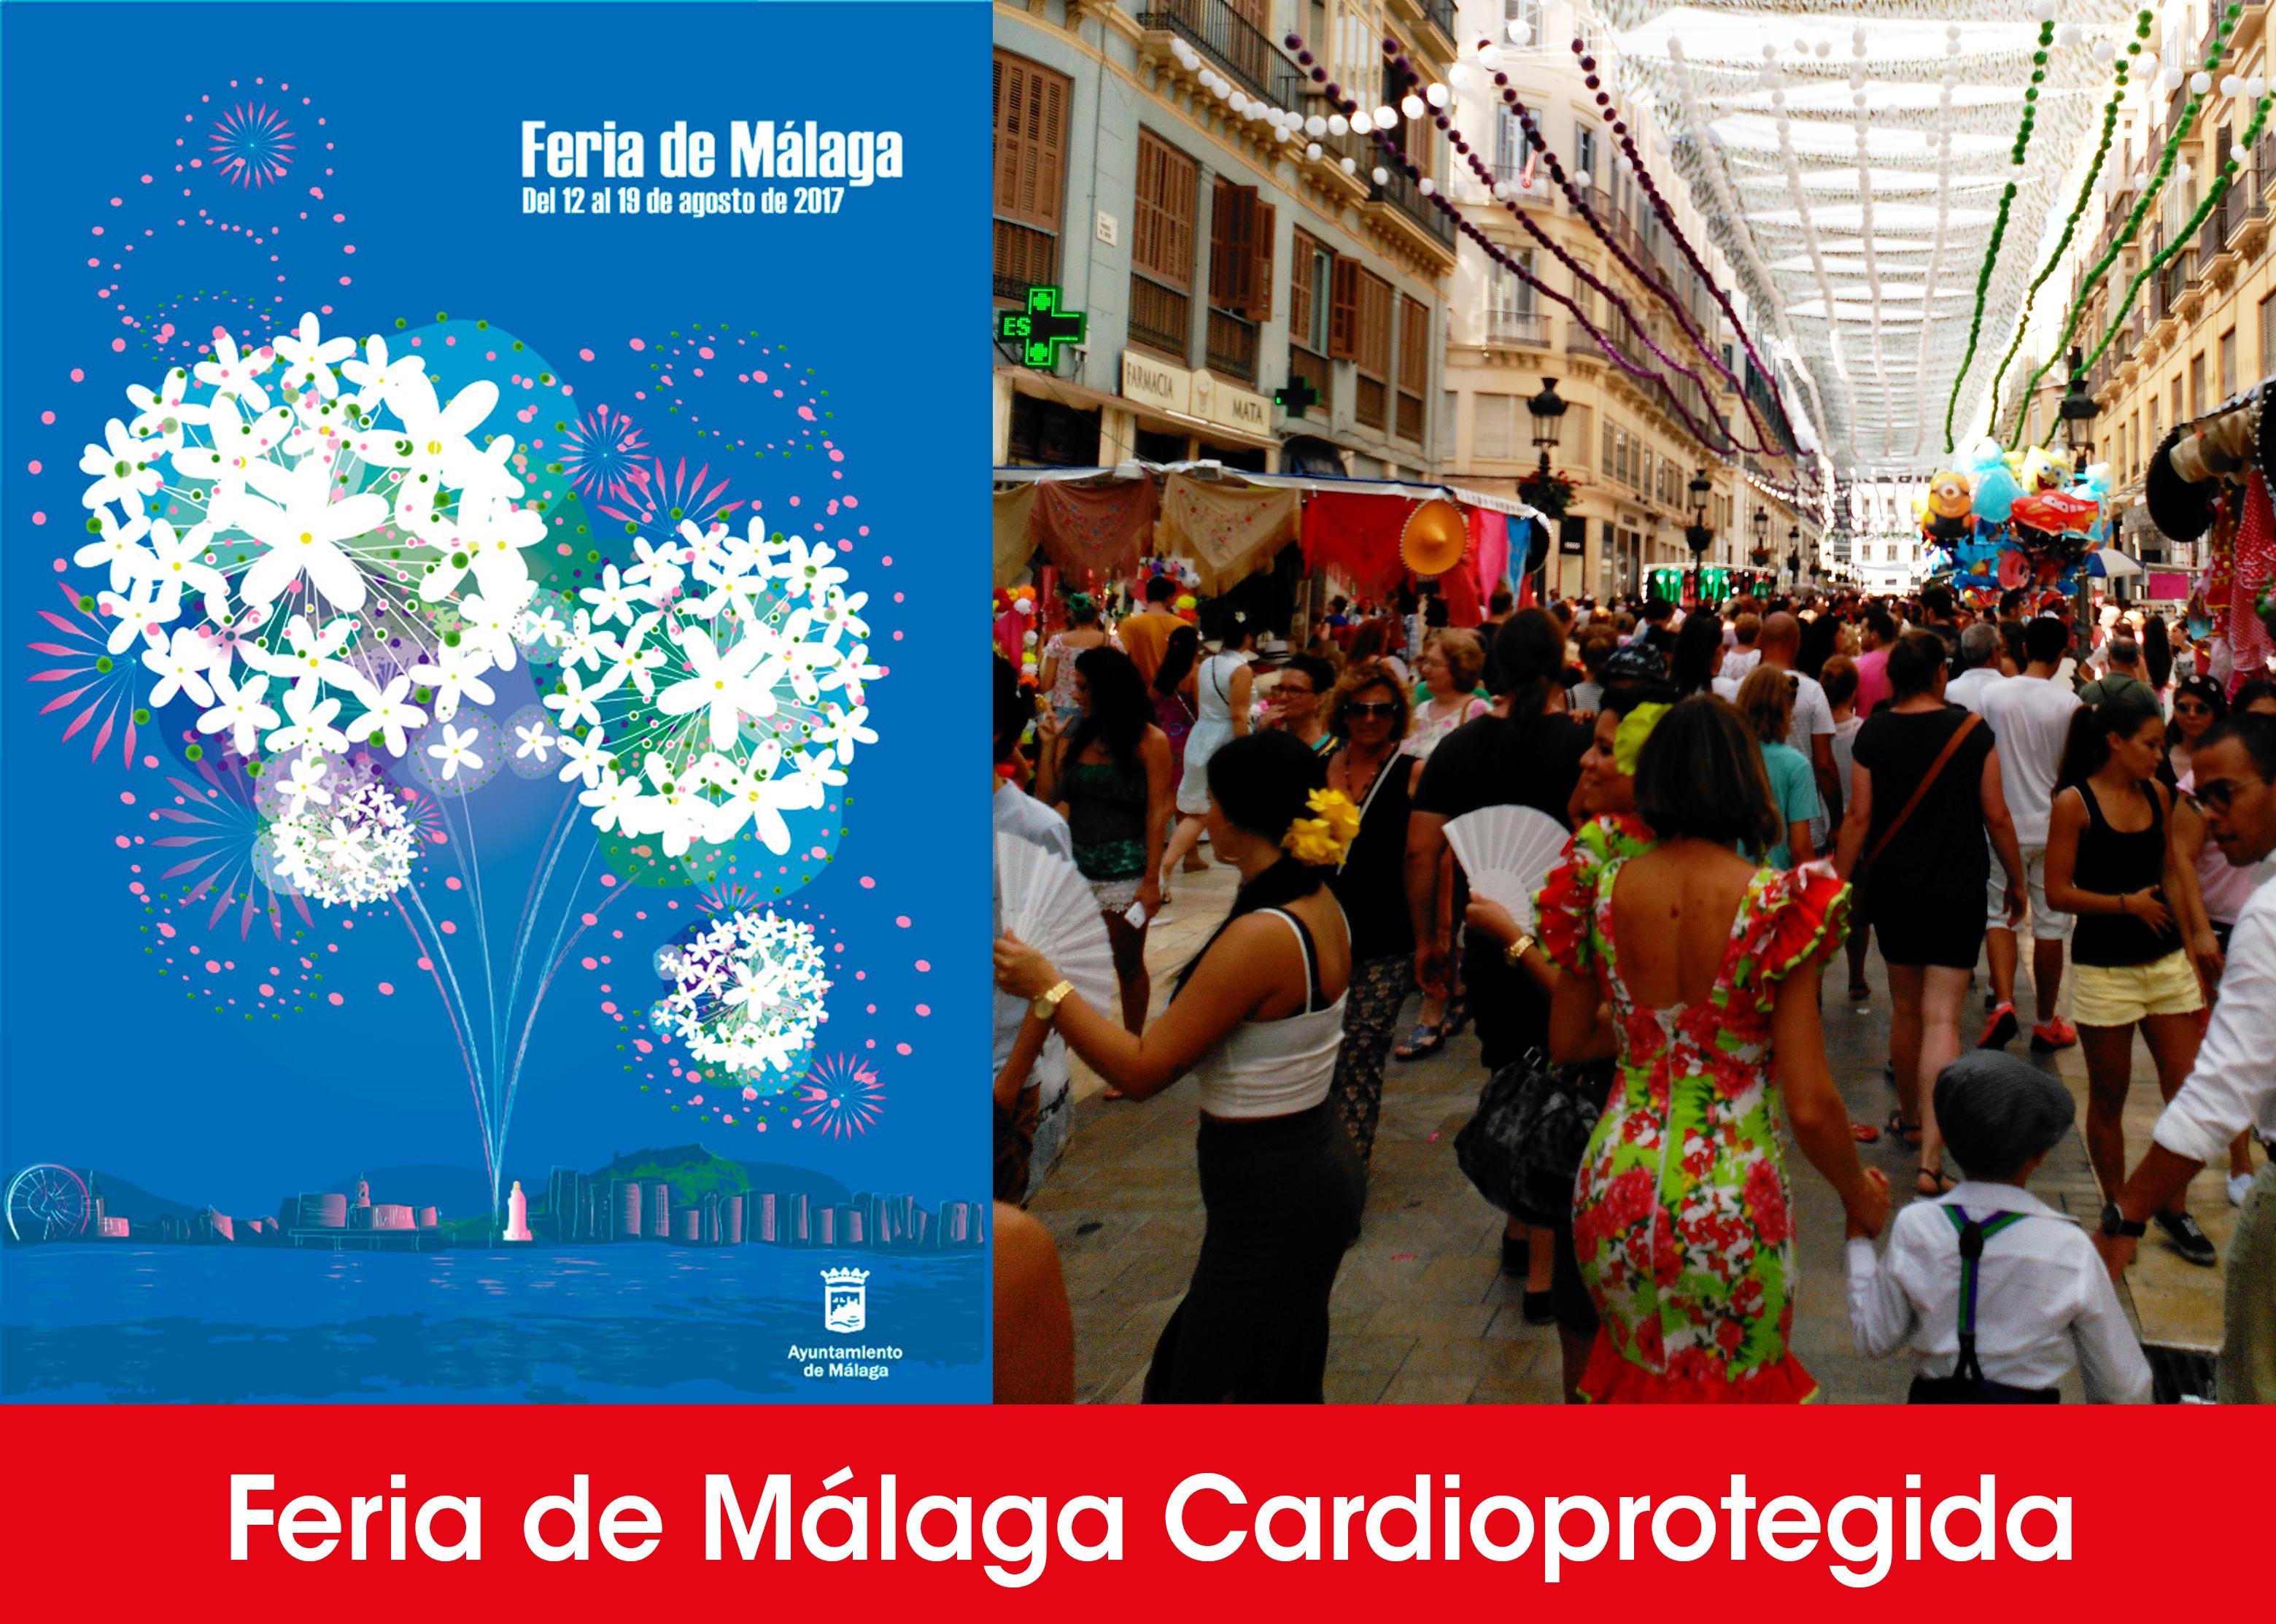 La feria de m laga cardioprotegida por proyecto vida for Feria outlet malaga 2017